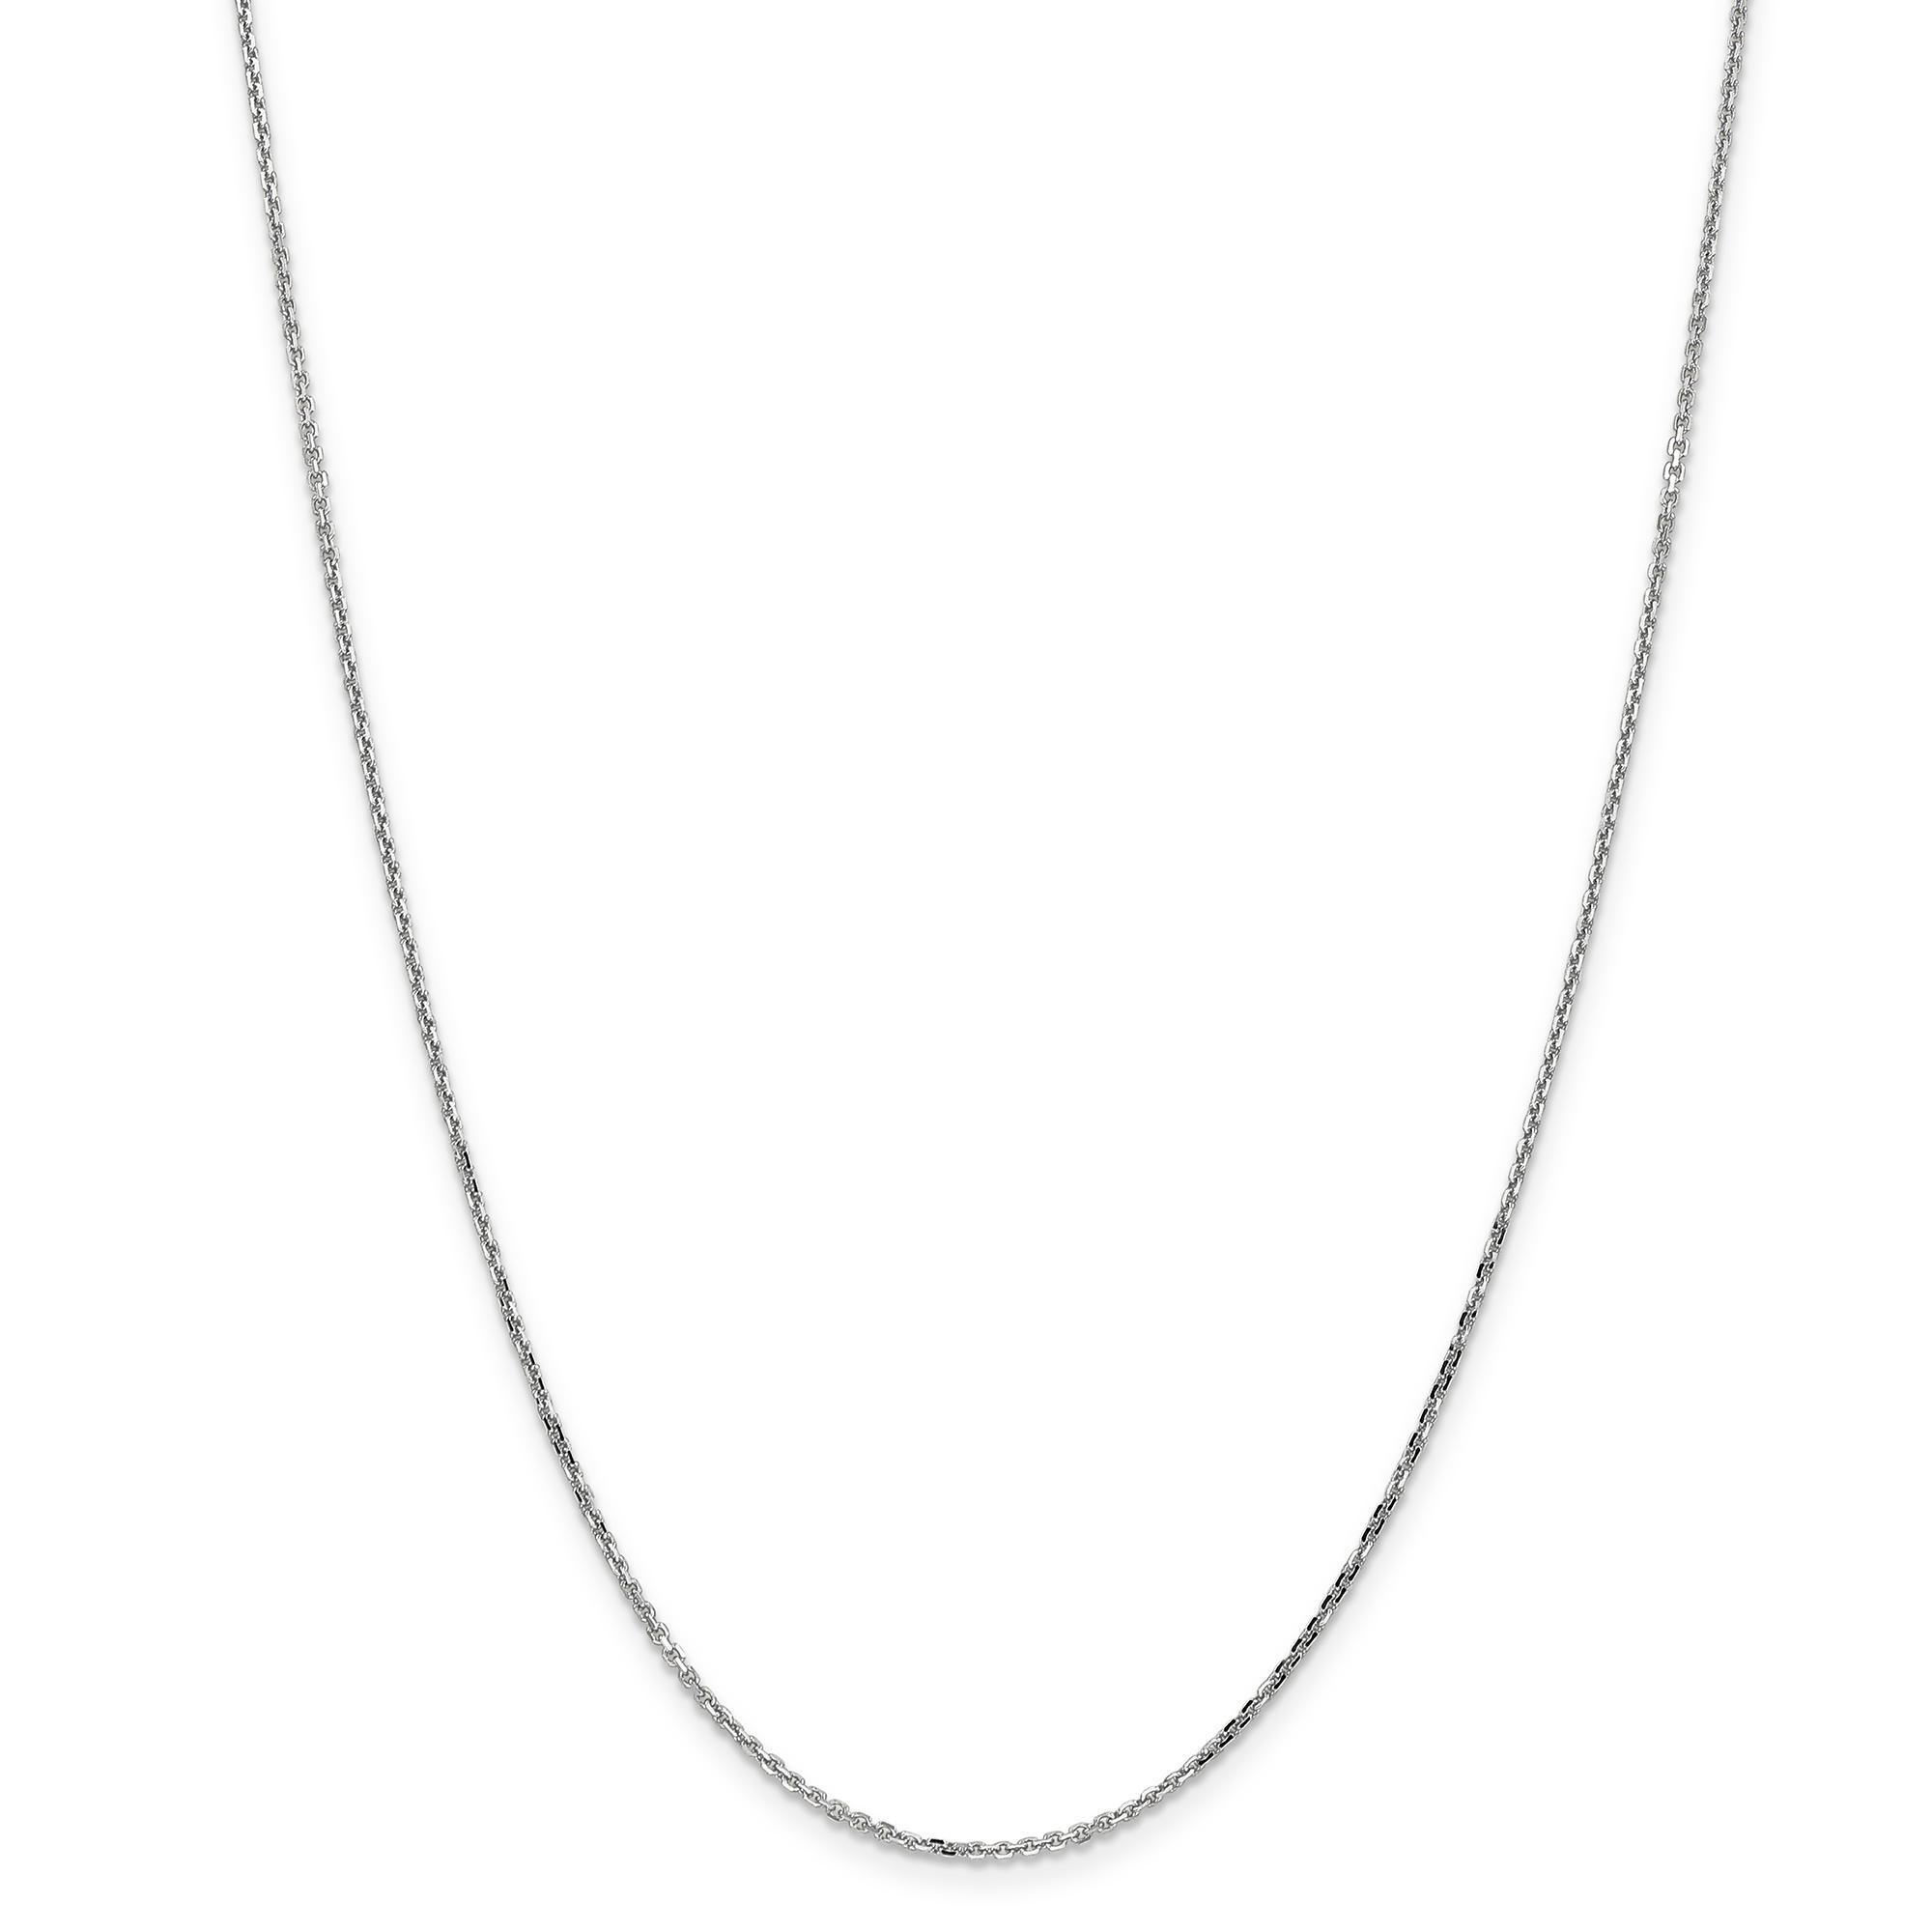 14K White Gold 1.40mm Diamond Cut Cable Chain 16 Inch - image 5 de 5